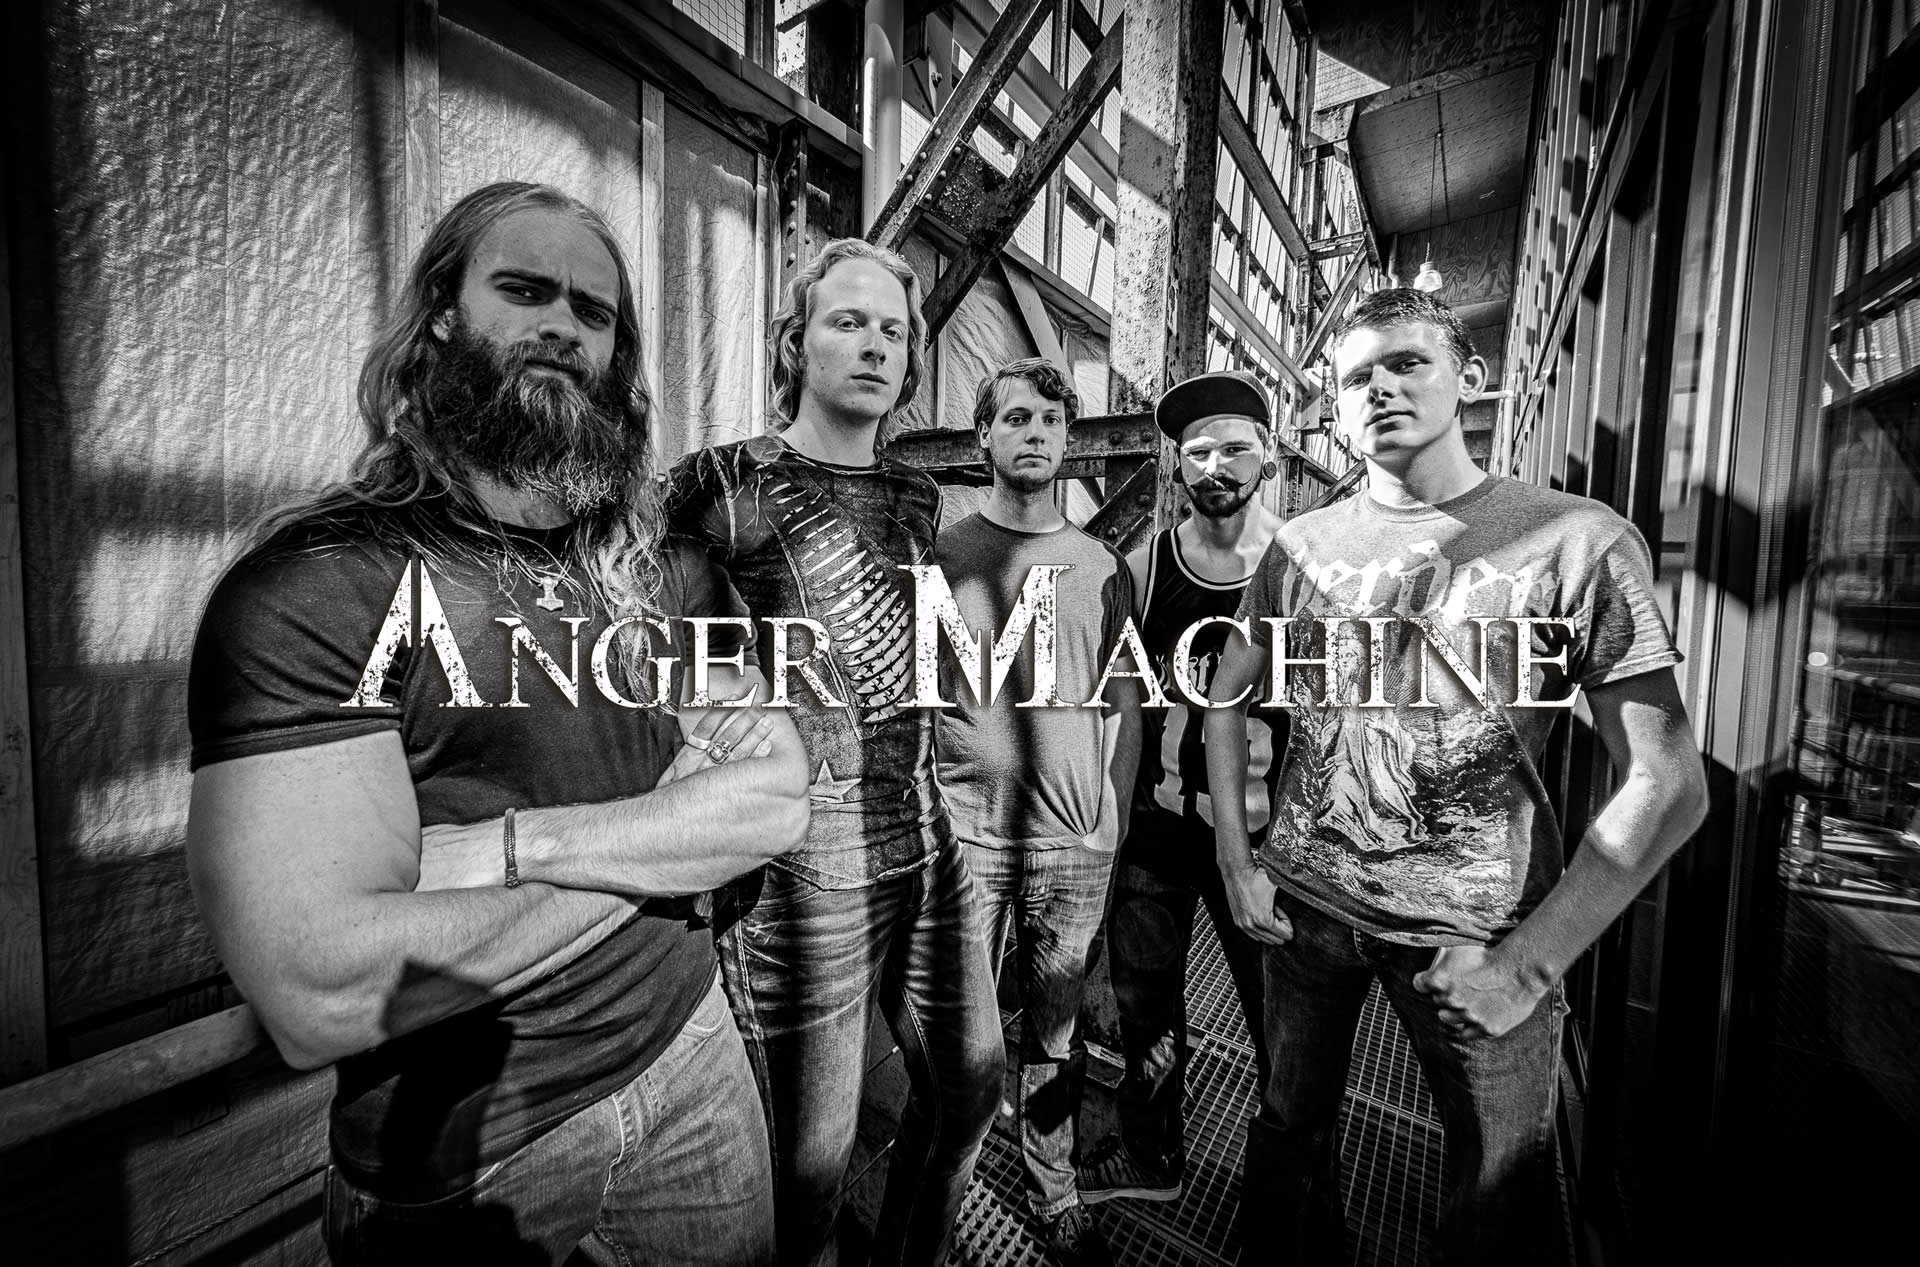 http://www.angermachine.nl/wp-content/uploads/2016/08/slide02-logo-1.jpg